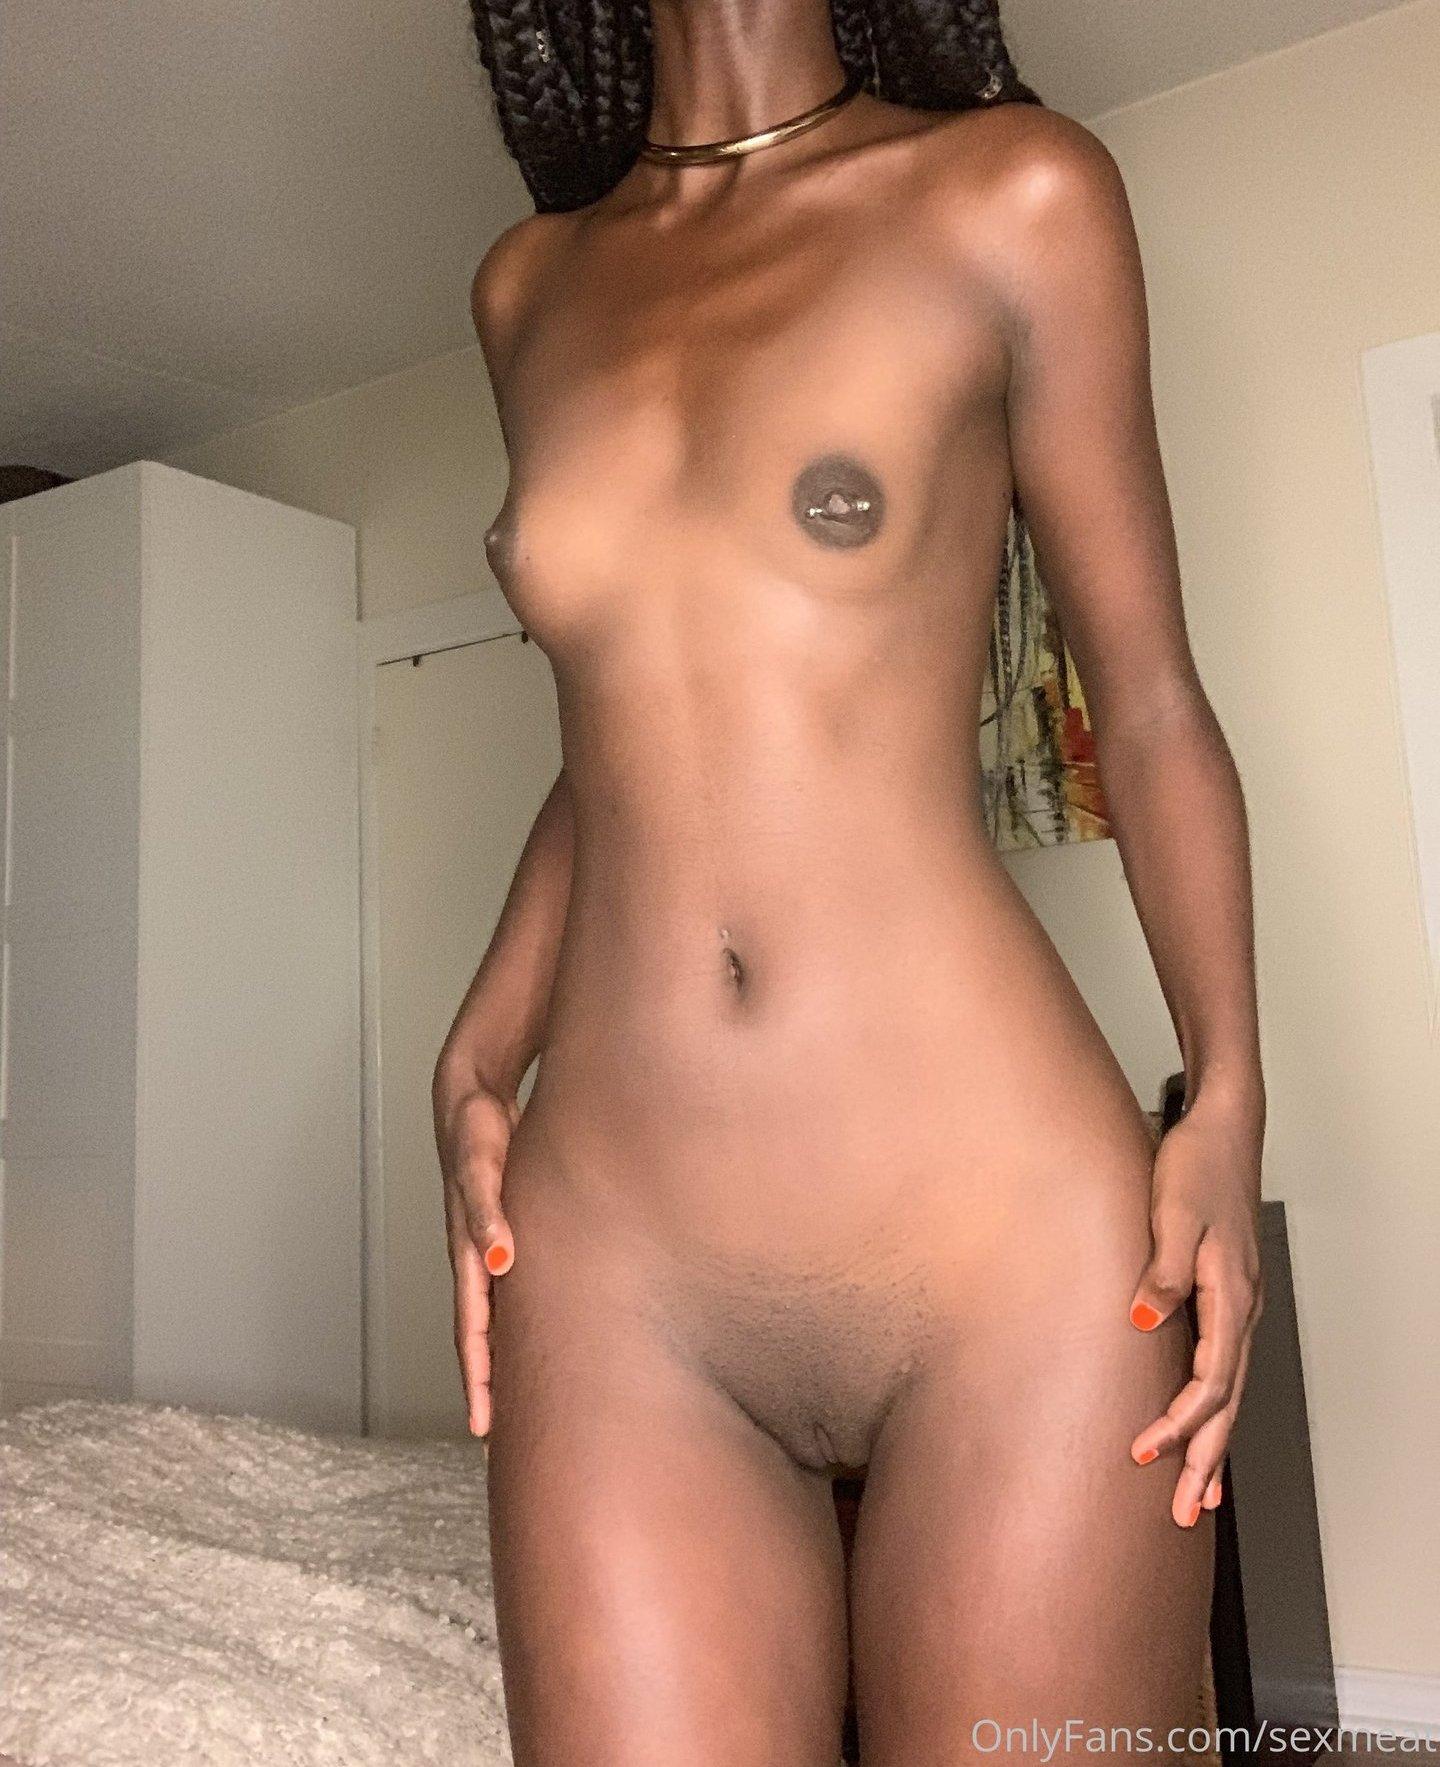 Sexmeat Sluttysexmeat Onlyfans Nude Leaks 0016